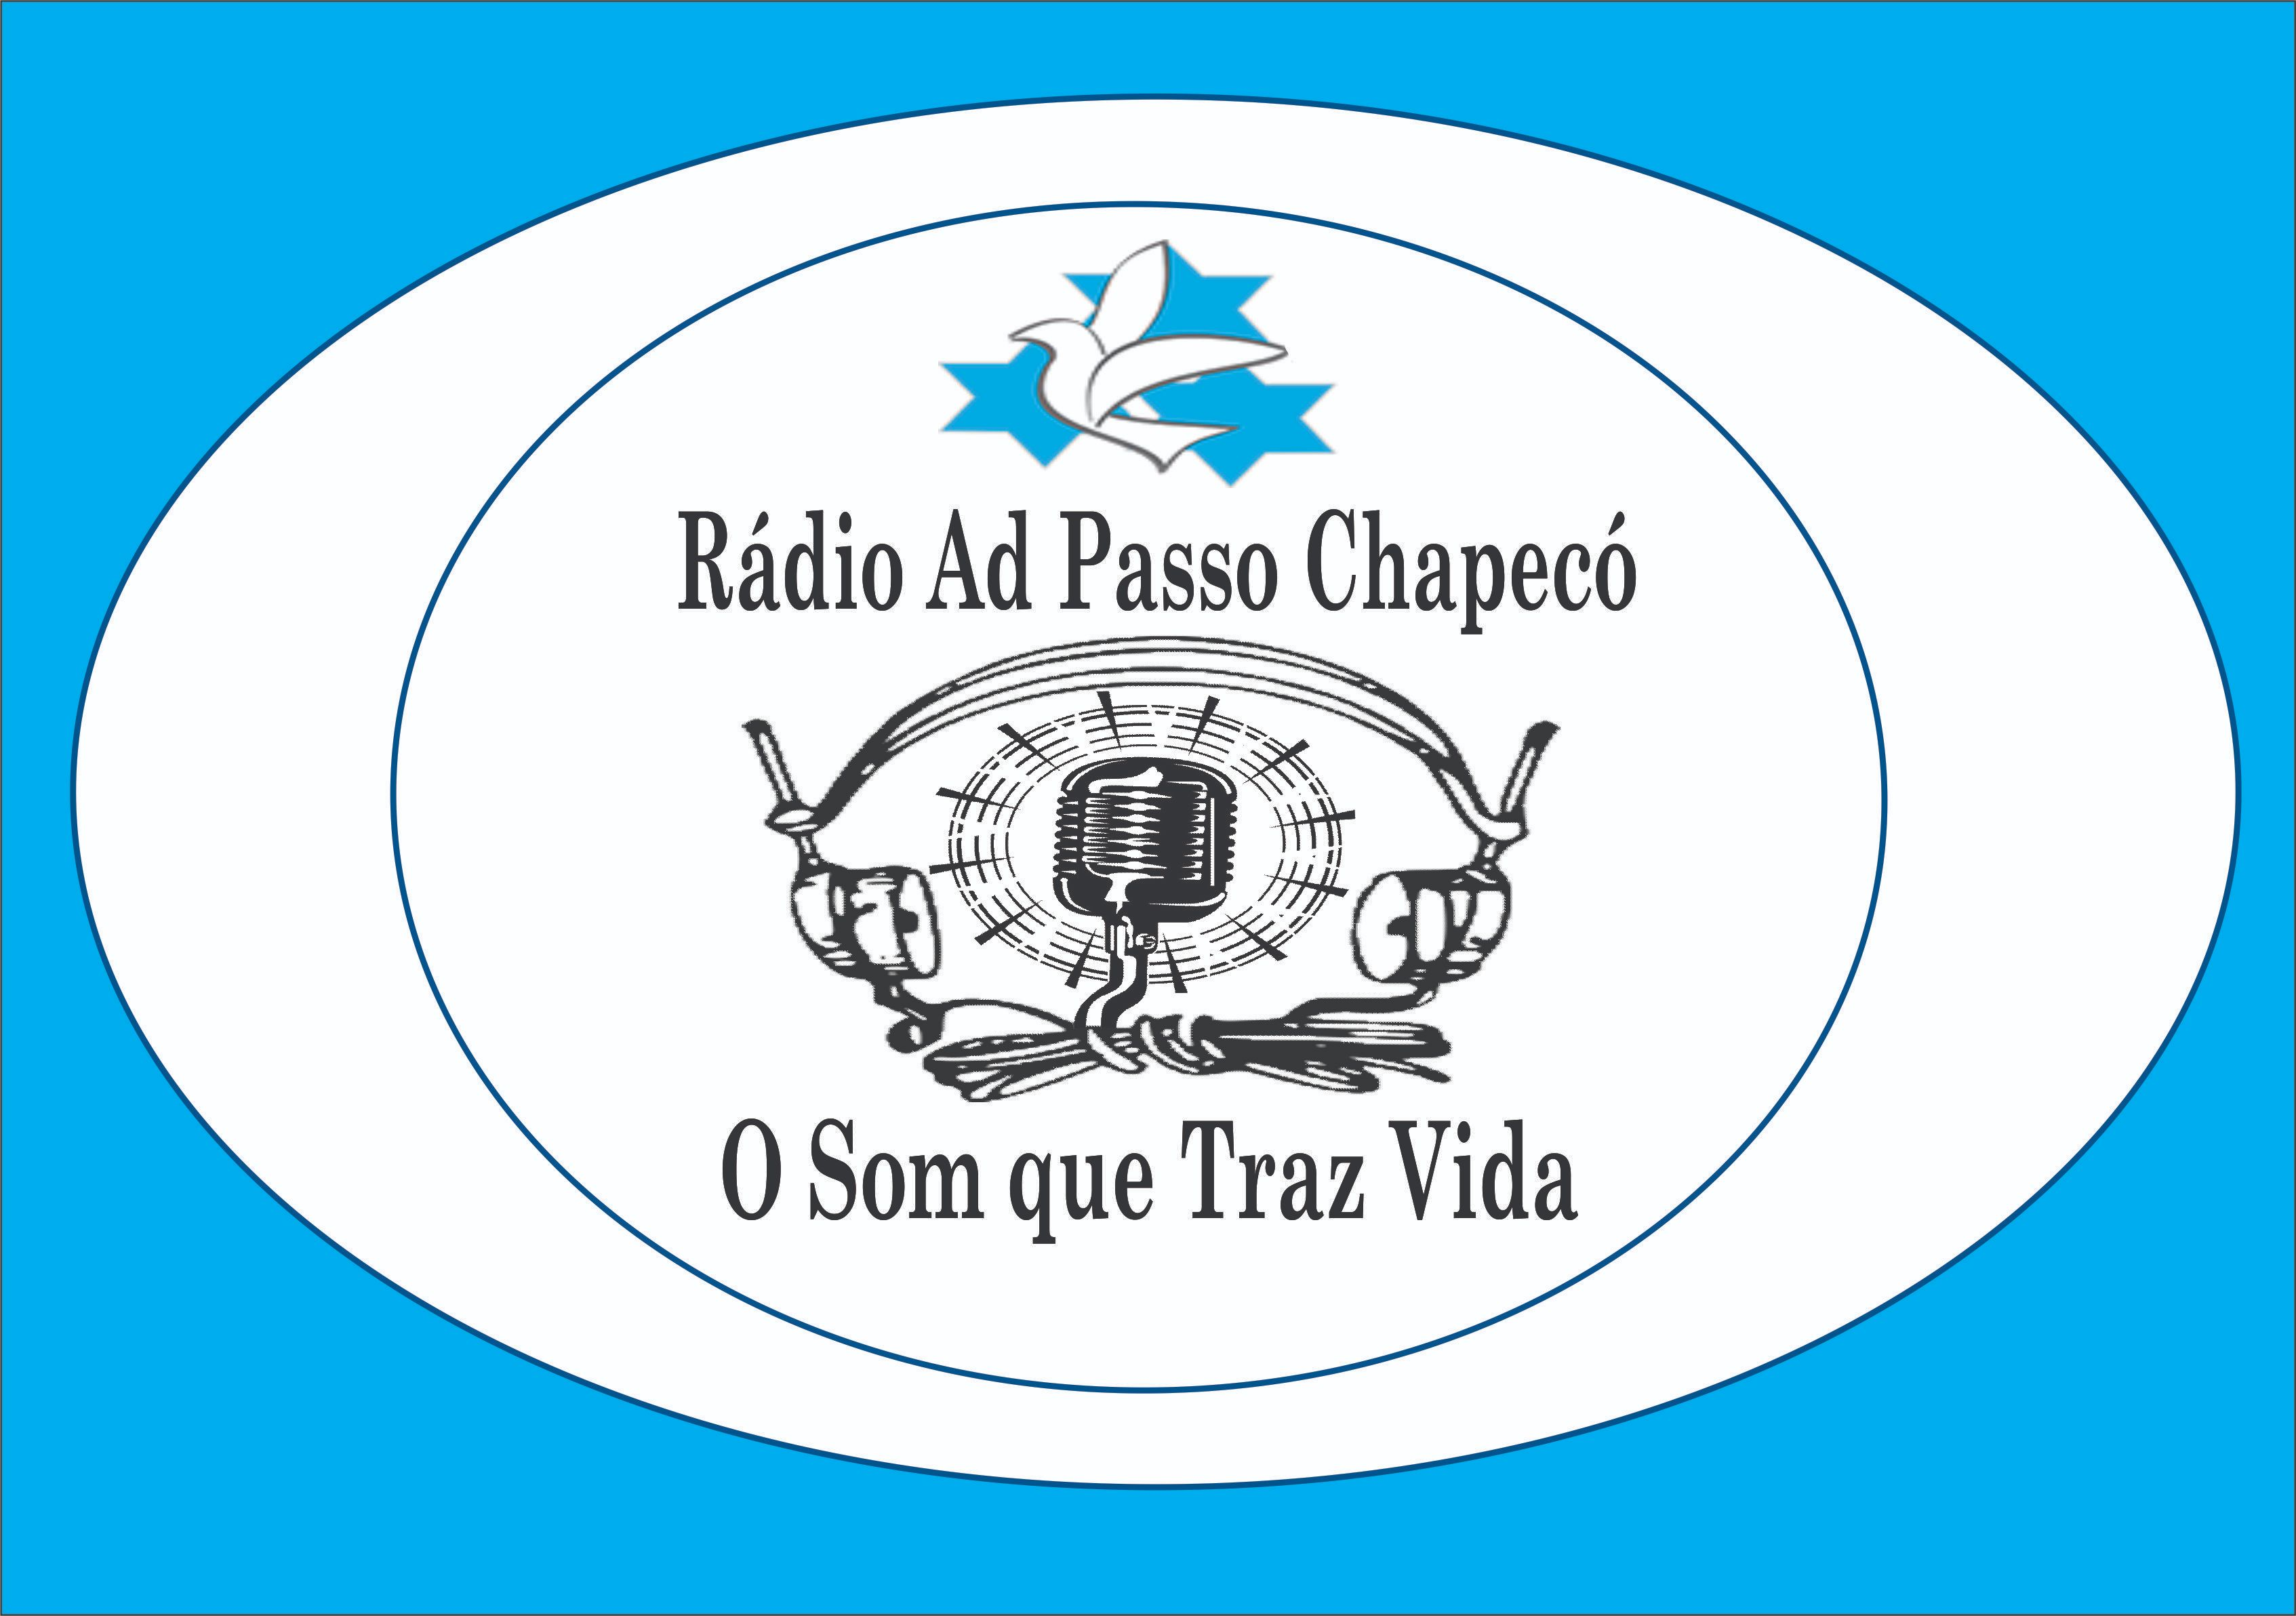 Rádio Ad Passo Chapecó